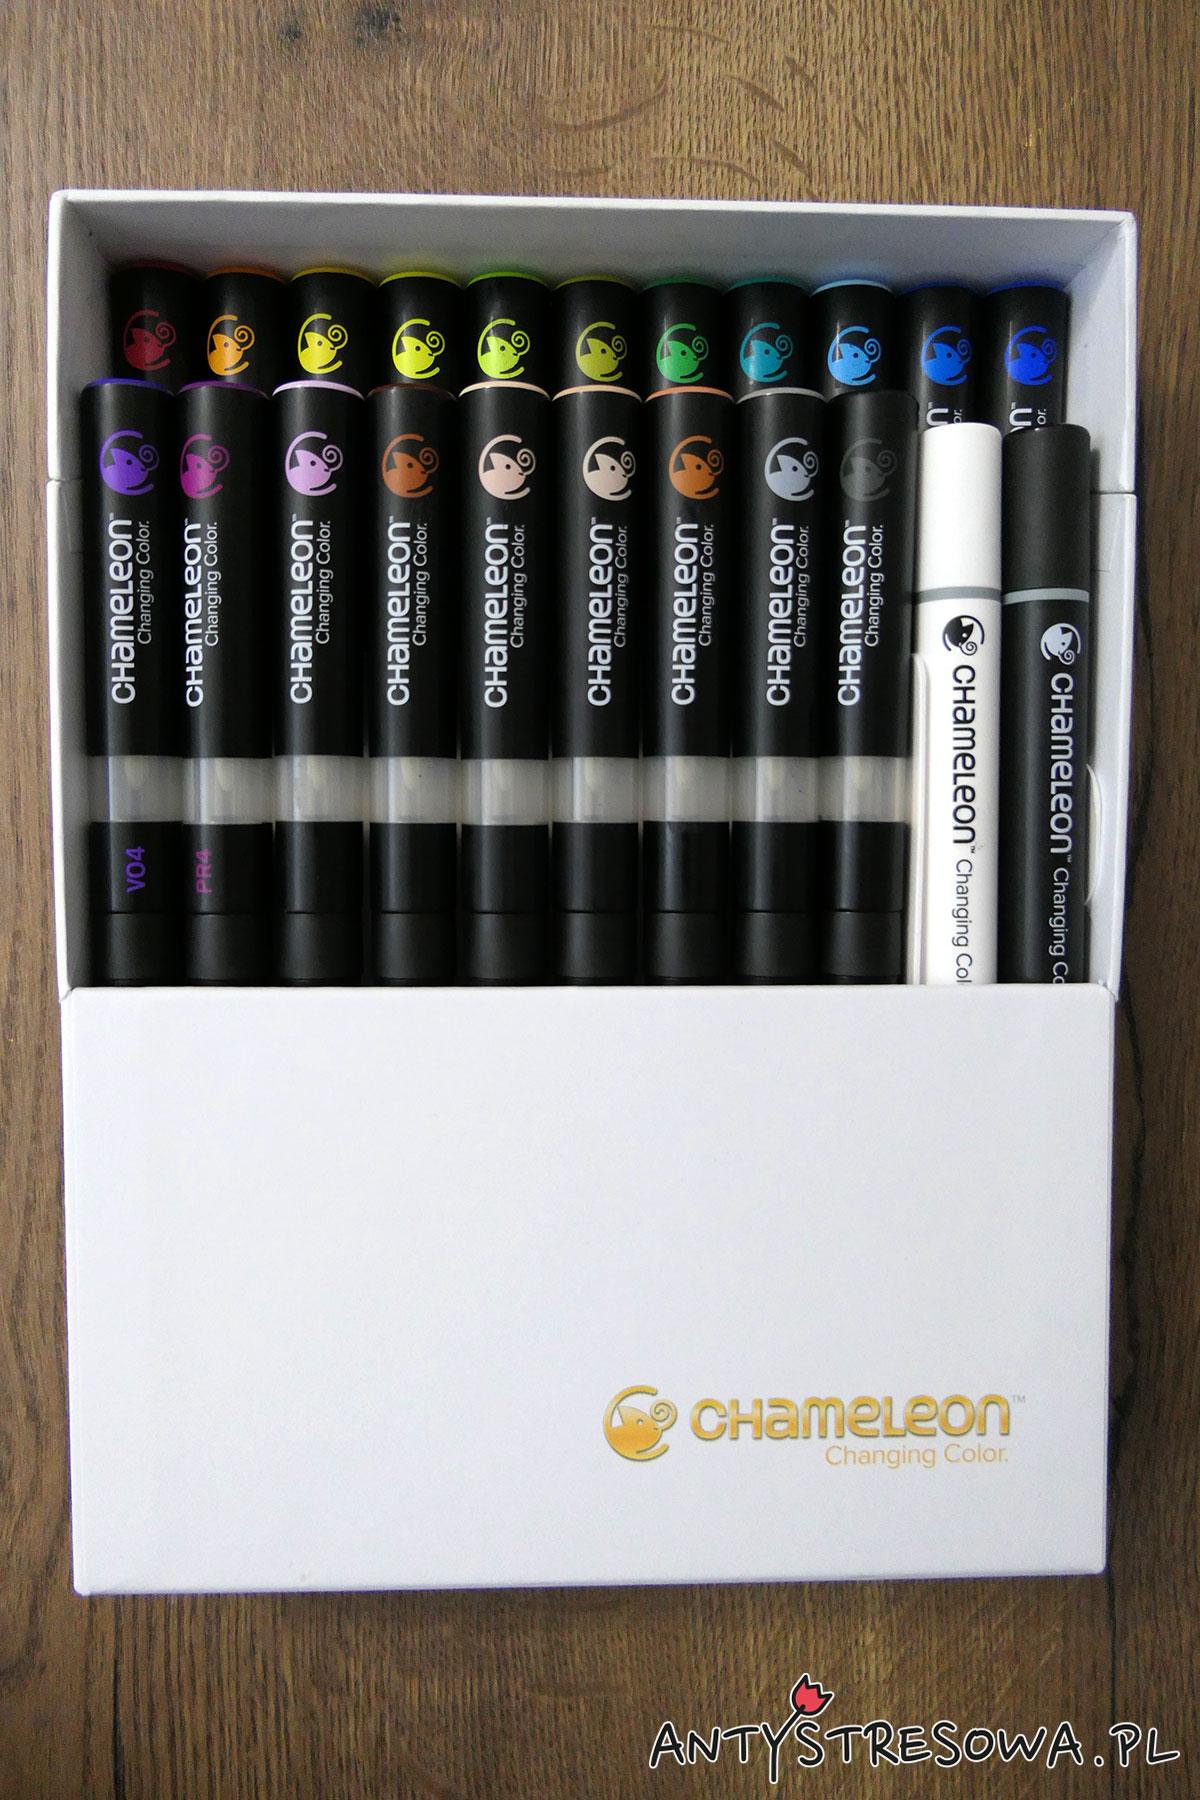 Chameleon zestaw 22 sztuk